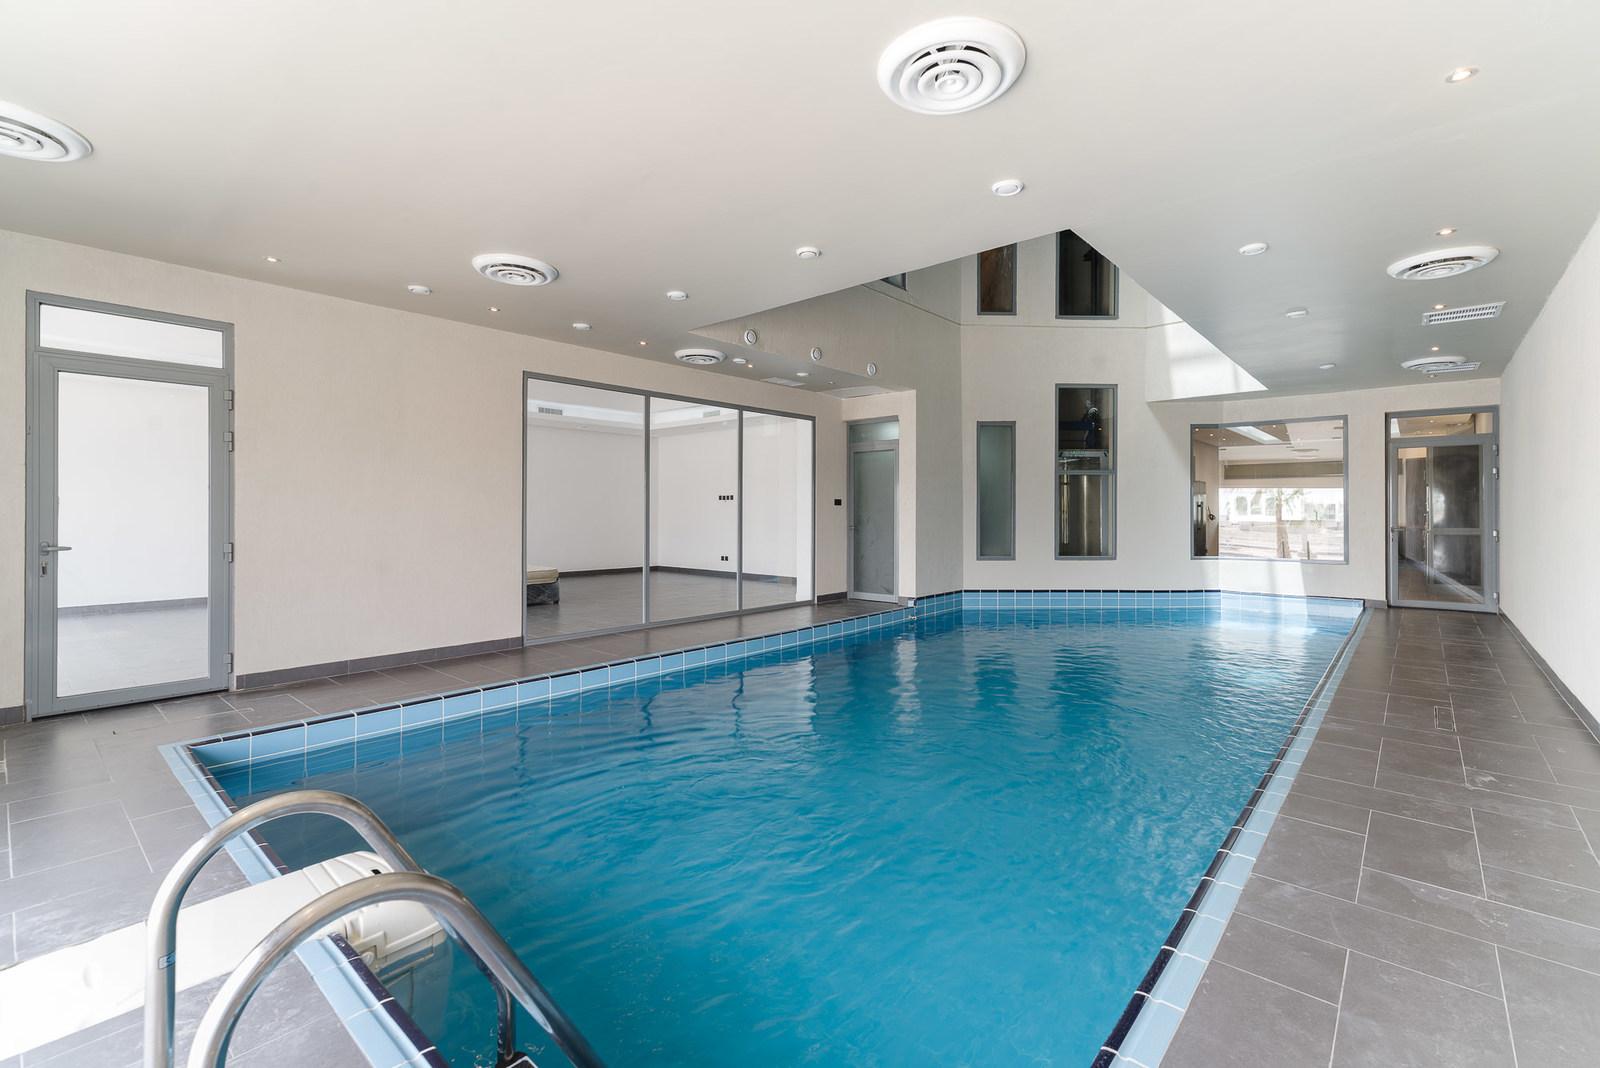 Jaber Al Ahmad – spacious, modern, six bedroom villa w/indoor pool